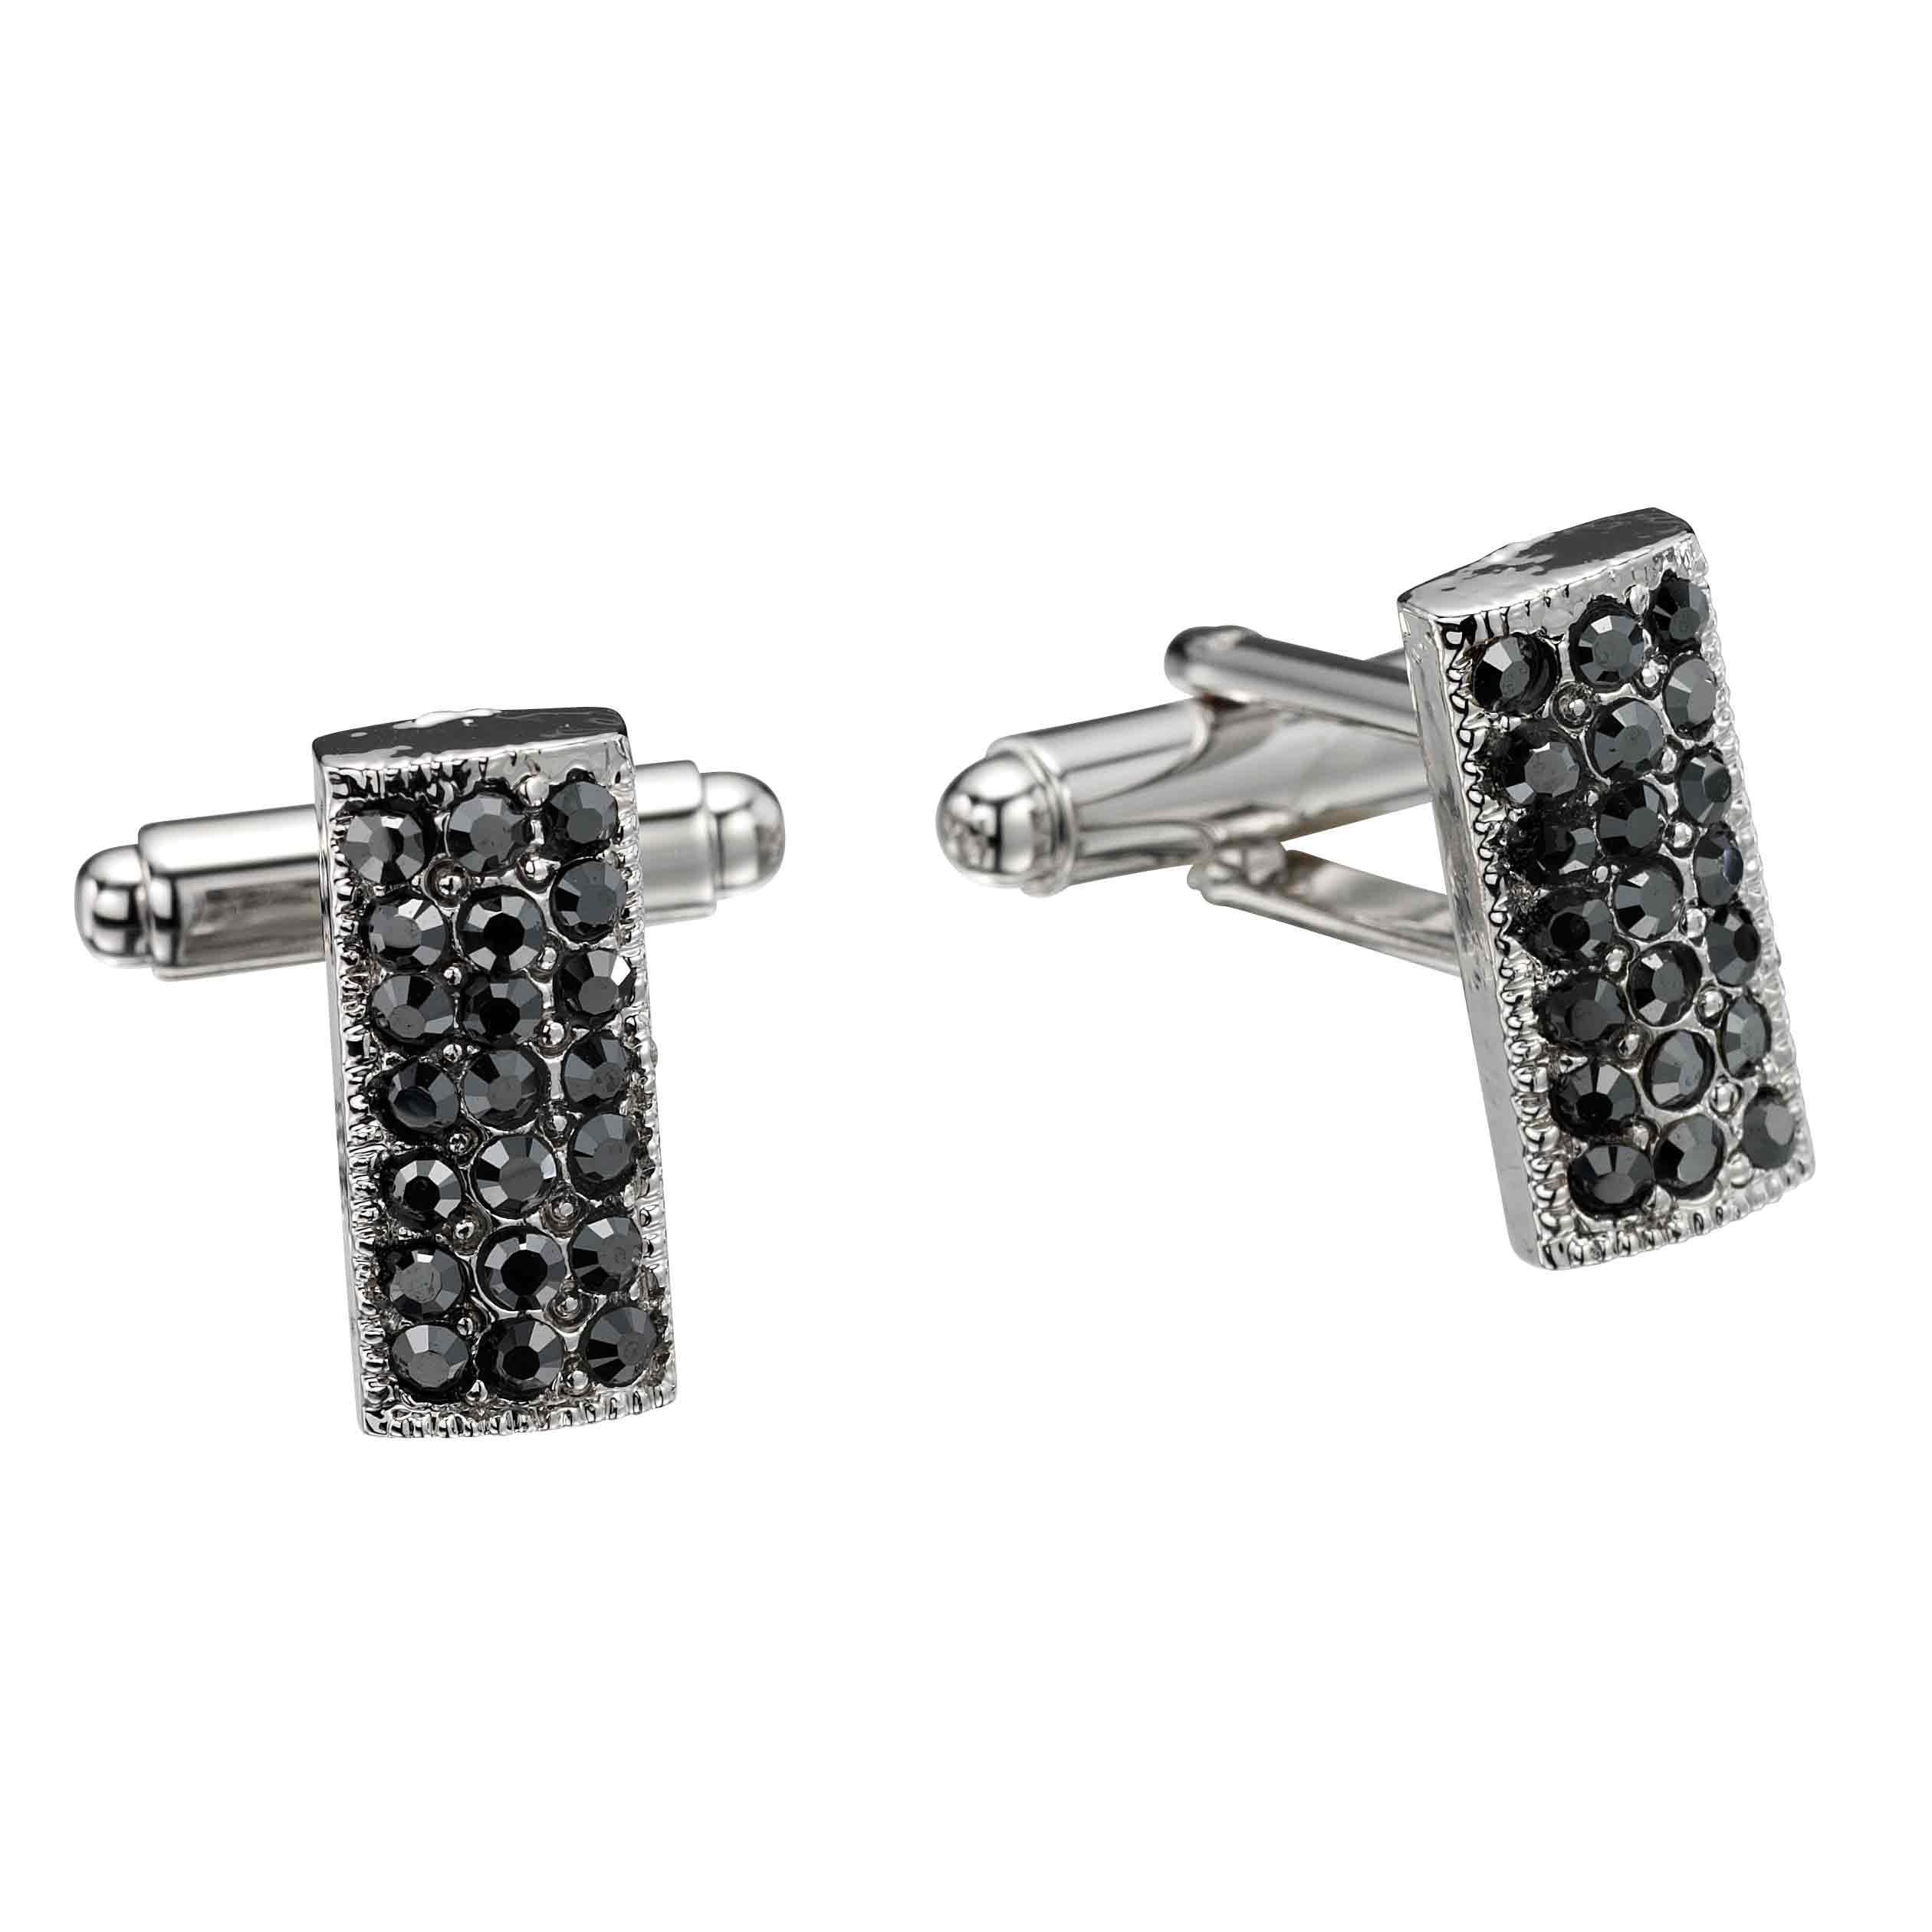 Jet Black Rectangle Swarovski Crystal Cufflinks Gemini London